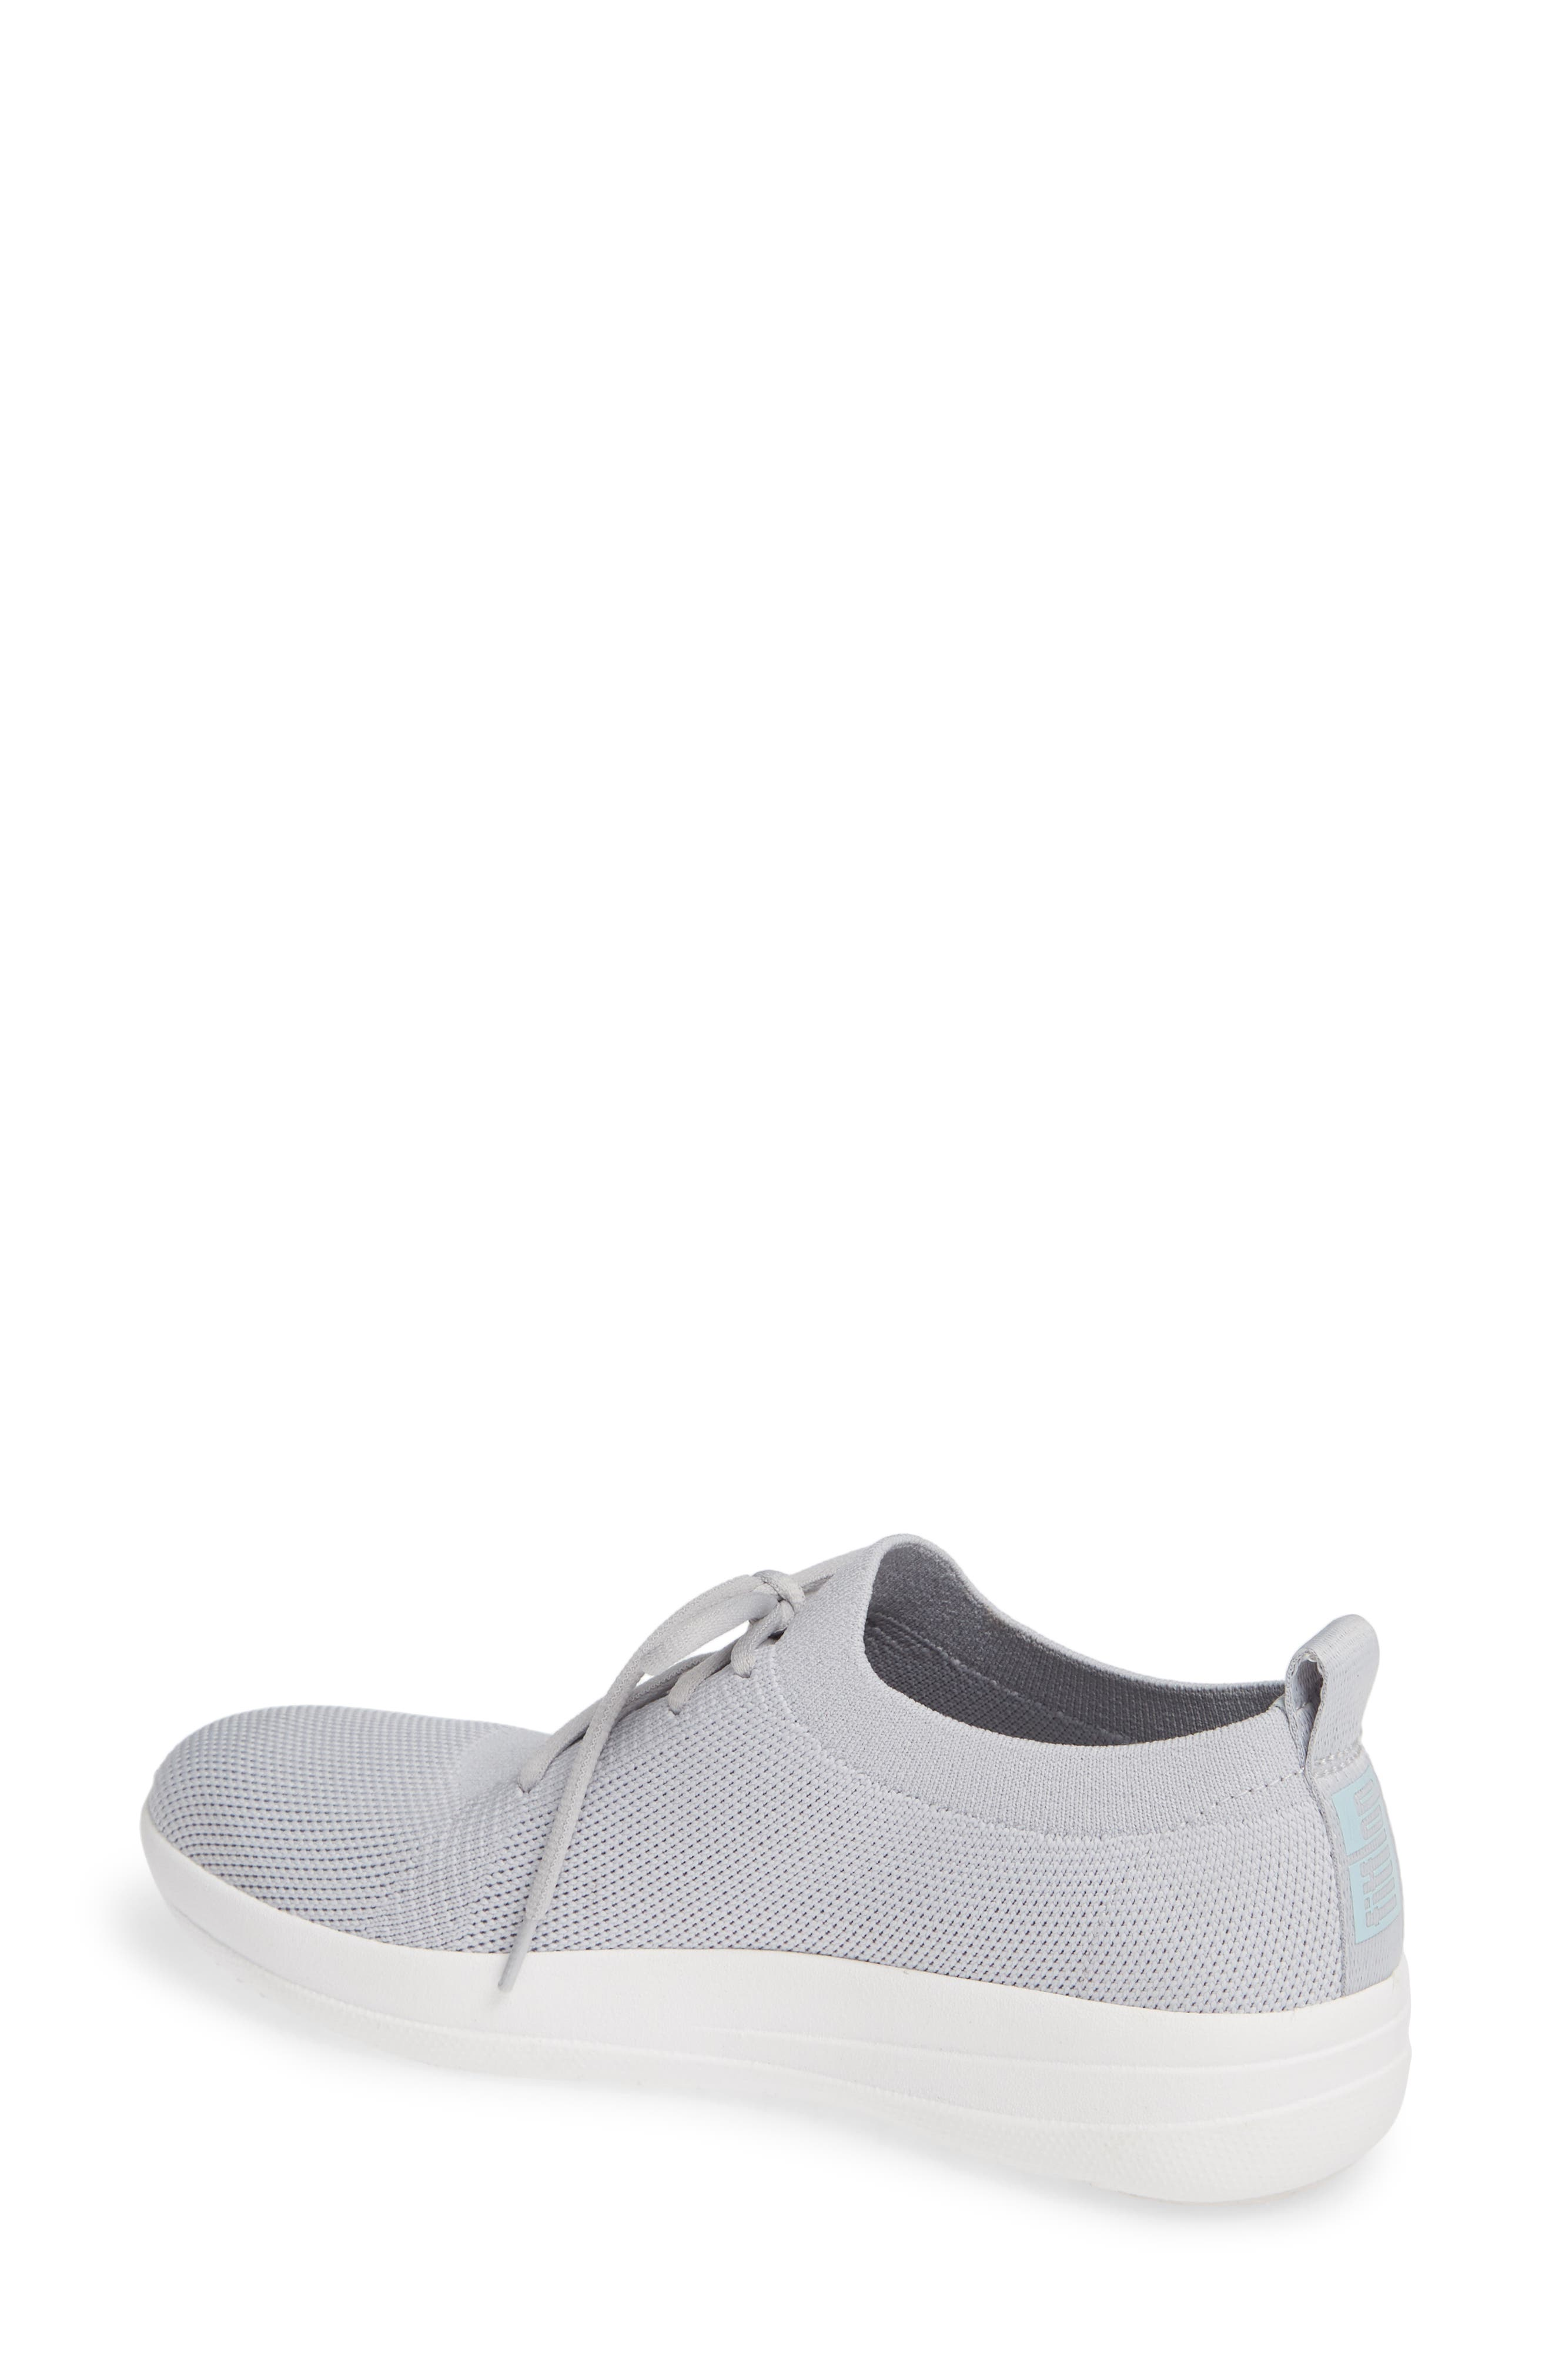 F-Sporty Uberknit<sup>™</sup> Sneaker,                             Alternate thumbnail 2, color,                             PEARL FABRIC